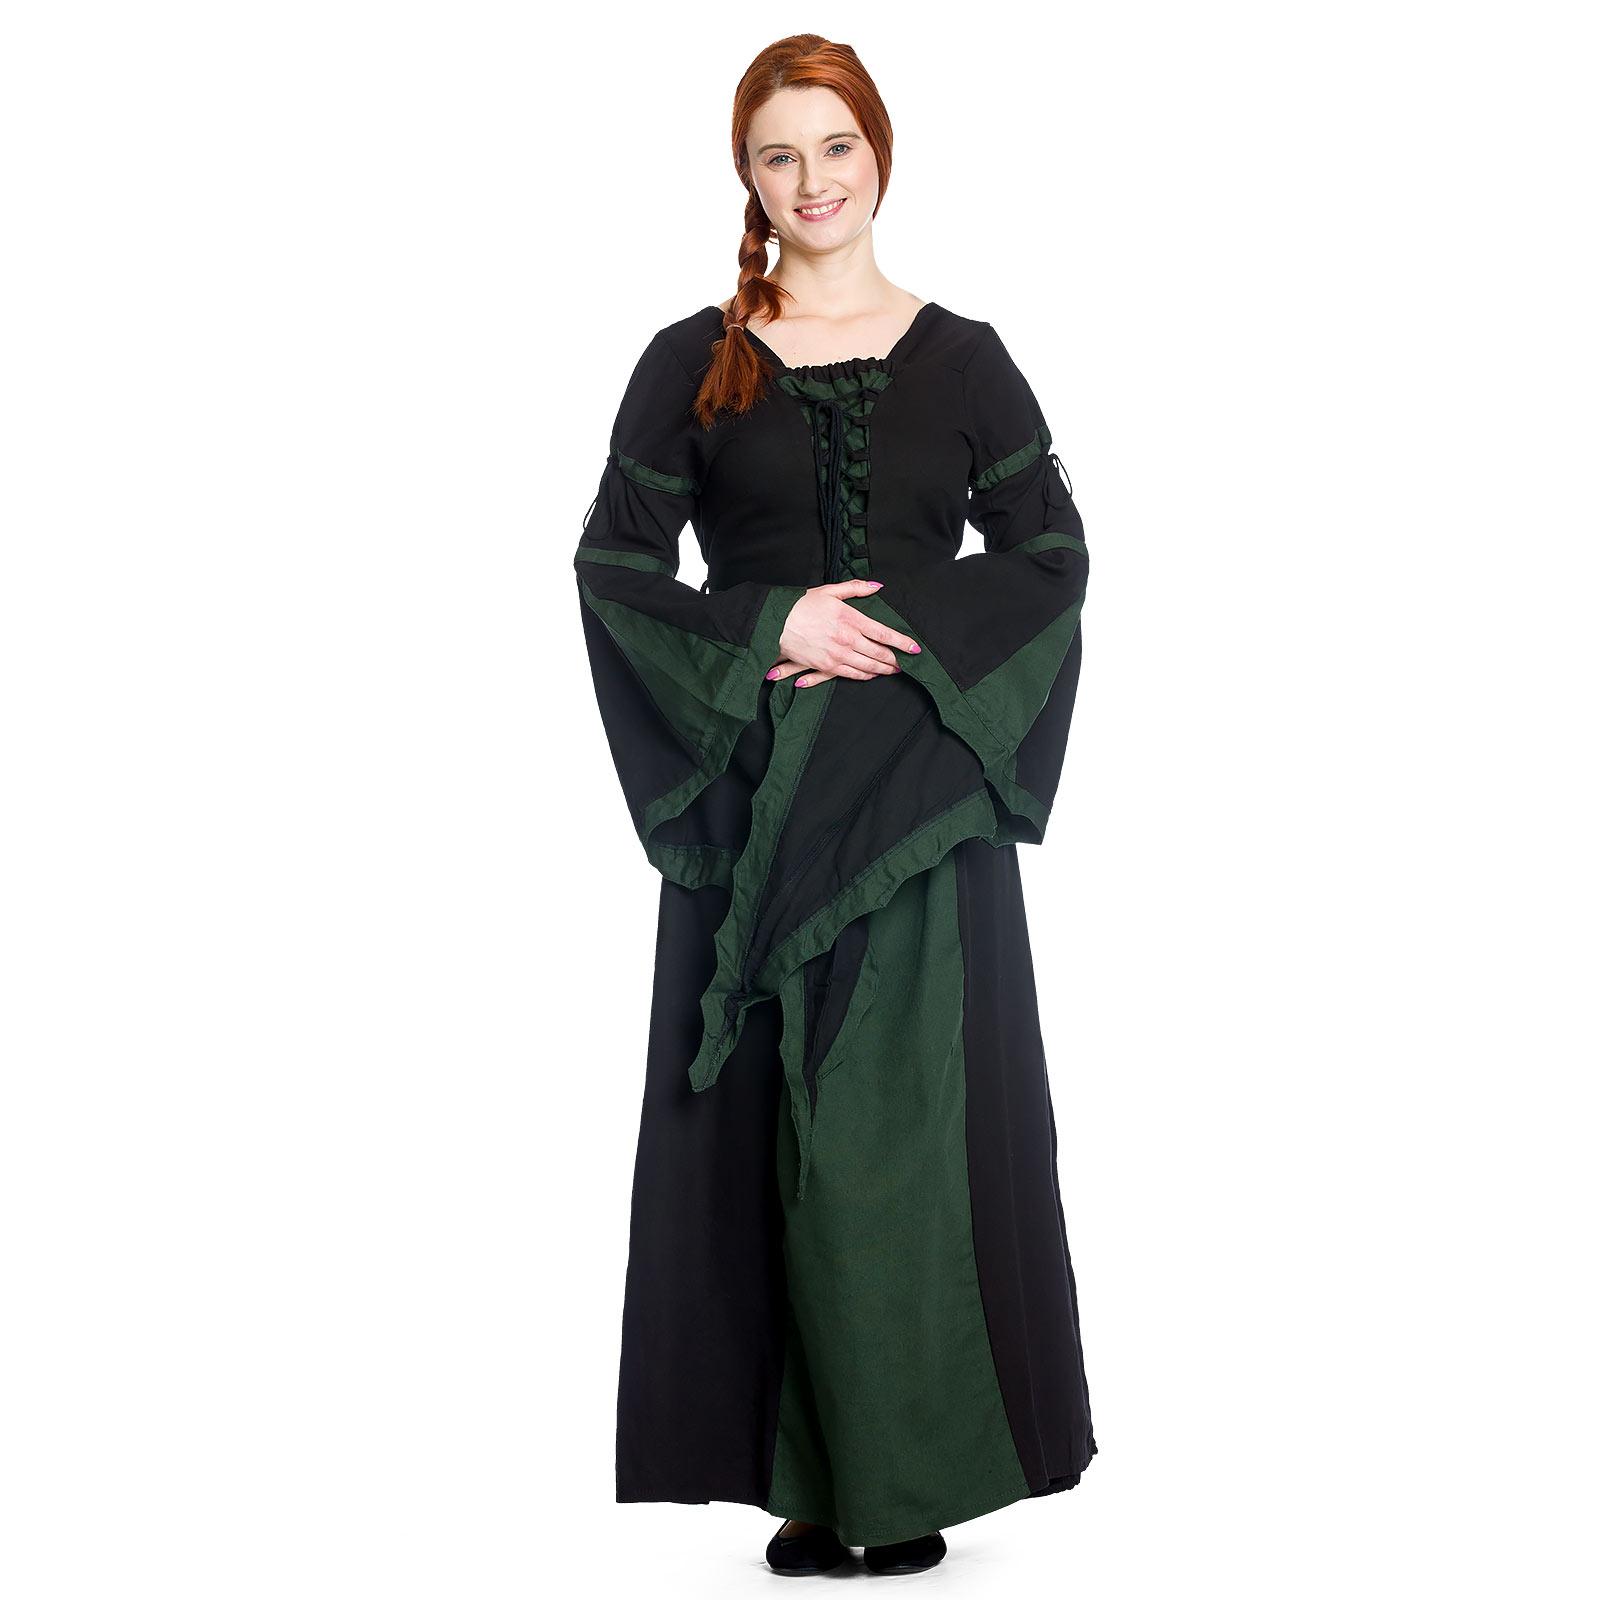 Leona - Mittelalterkleid schwarz-grün